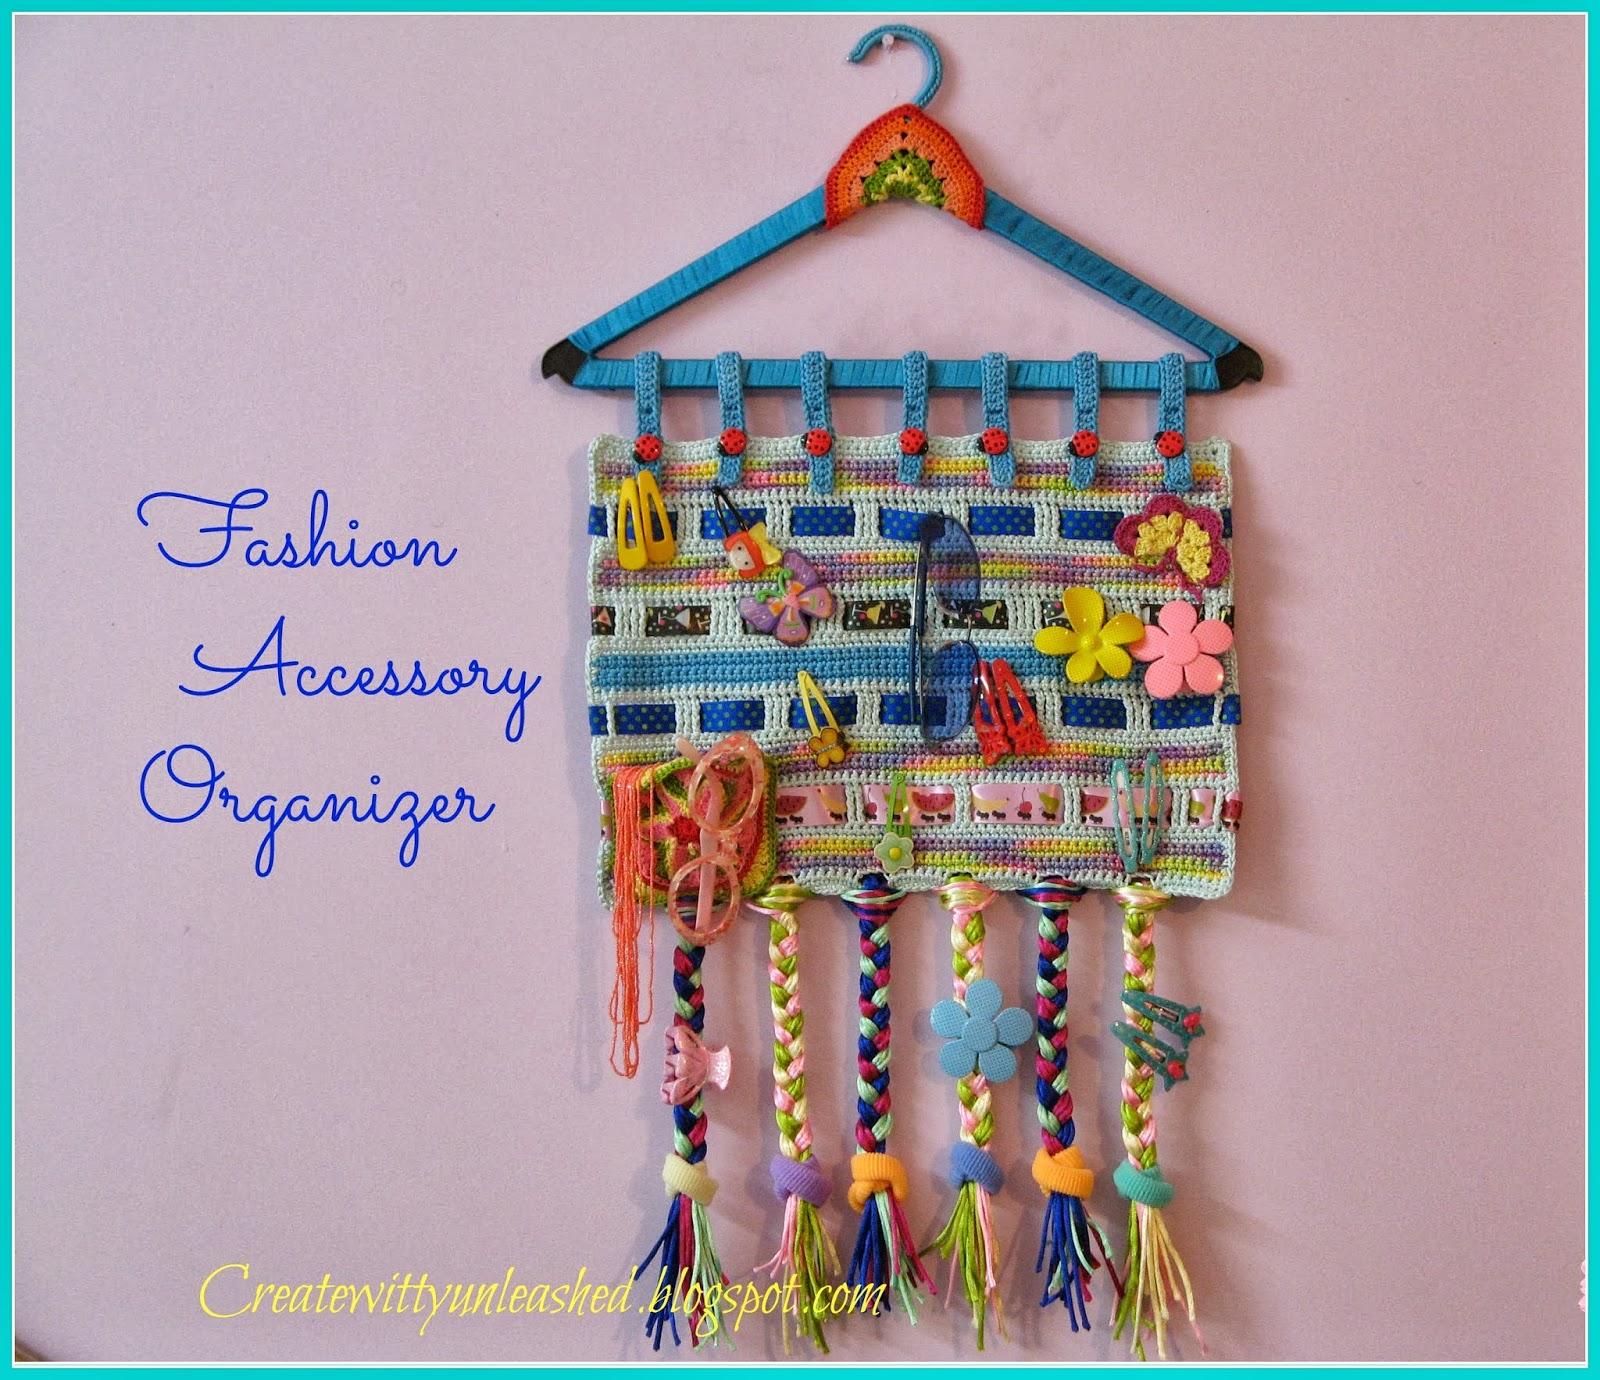 Creat E witty Unleashed Fashion accessory organizer